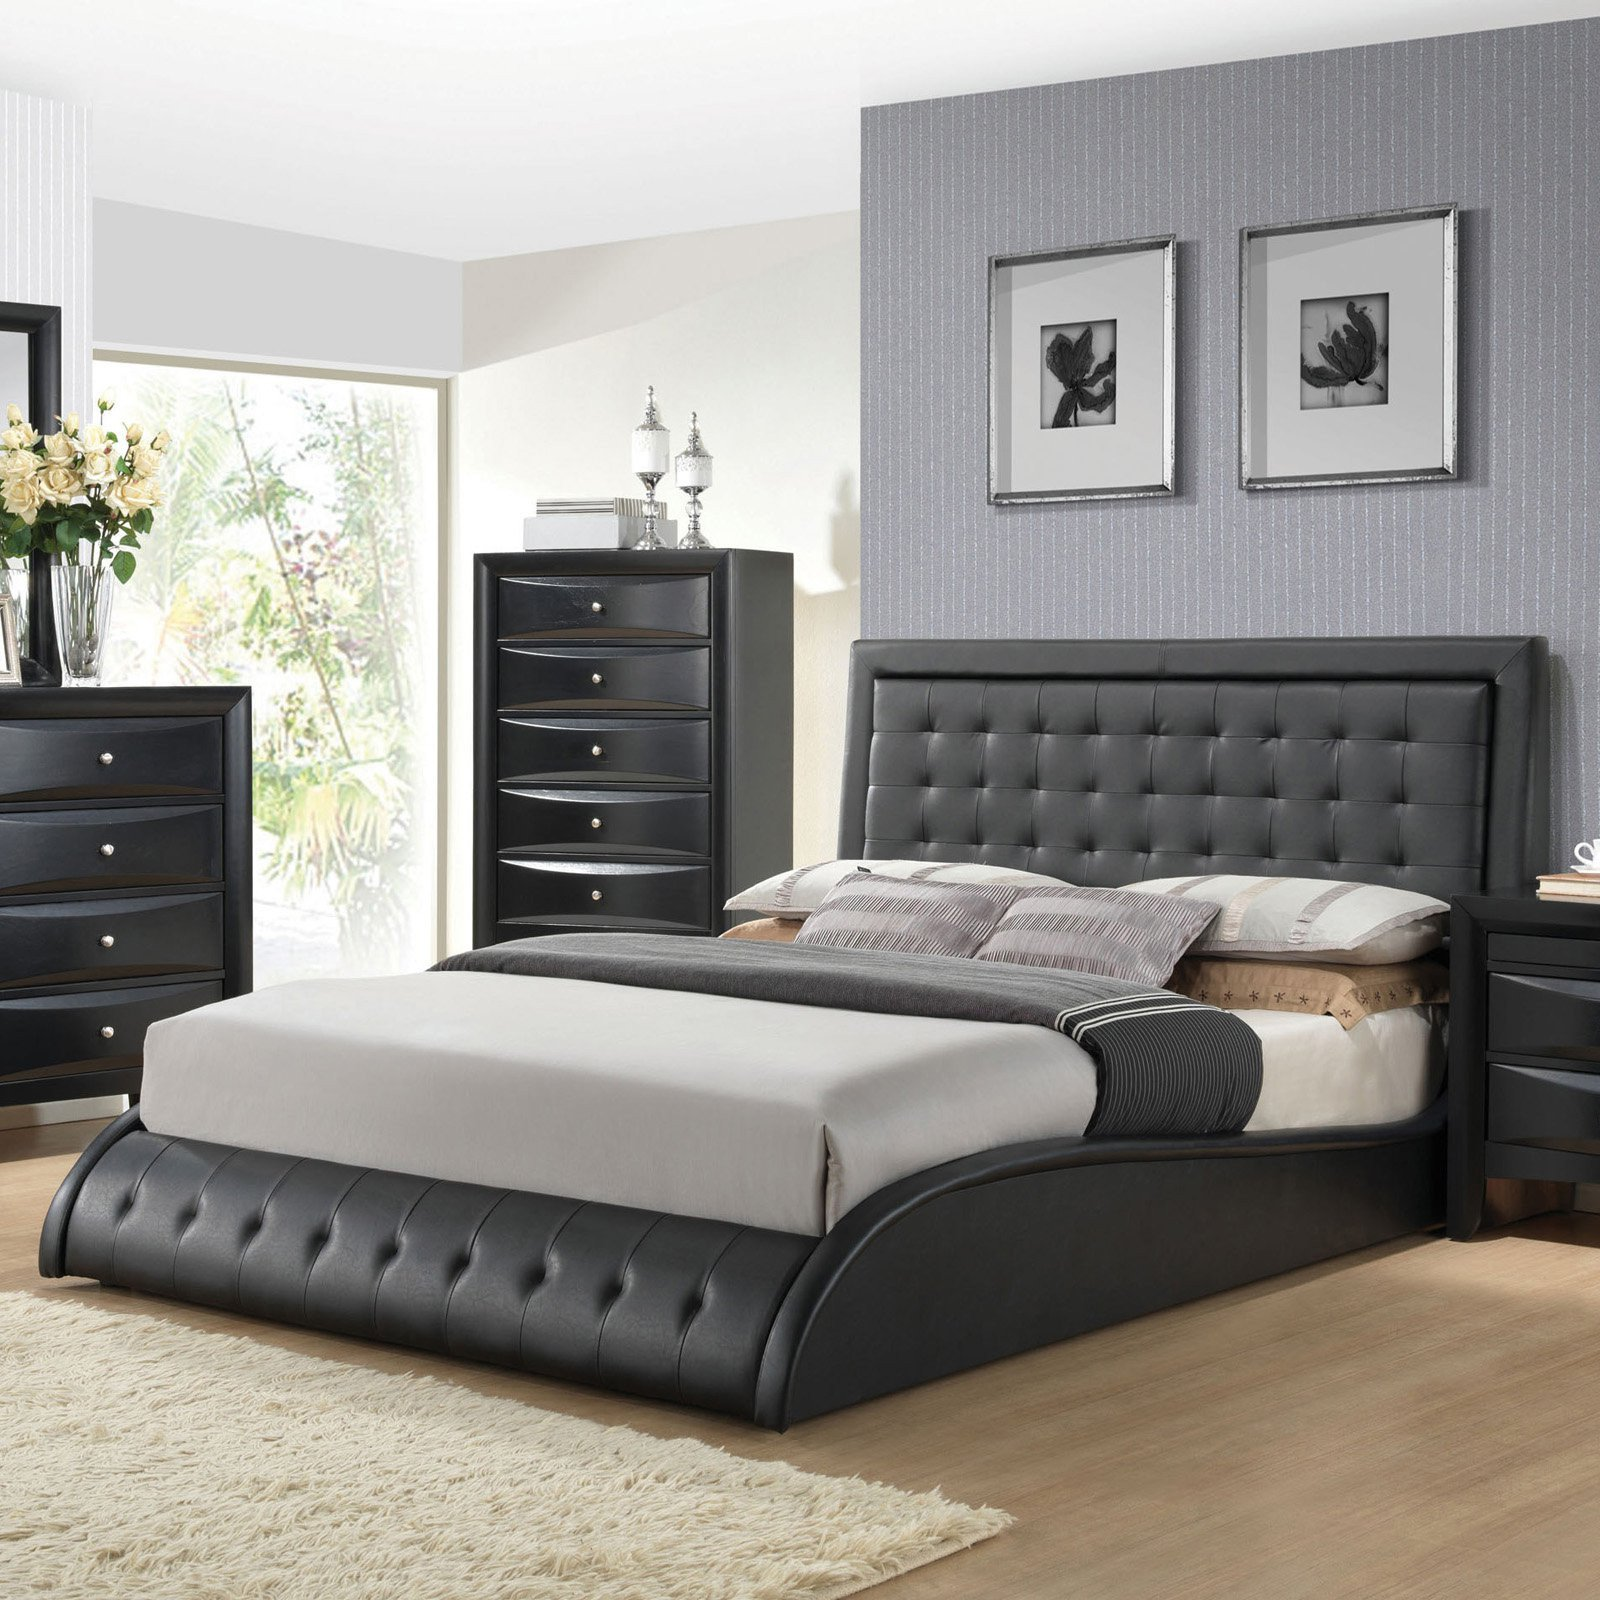 Acme Furniture Bedroom Set Beautiful Acme Furniture Tirrel Platform Bed Size Queen